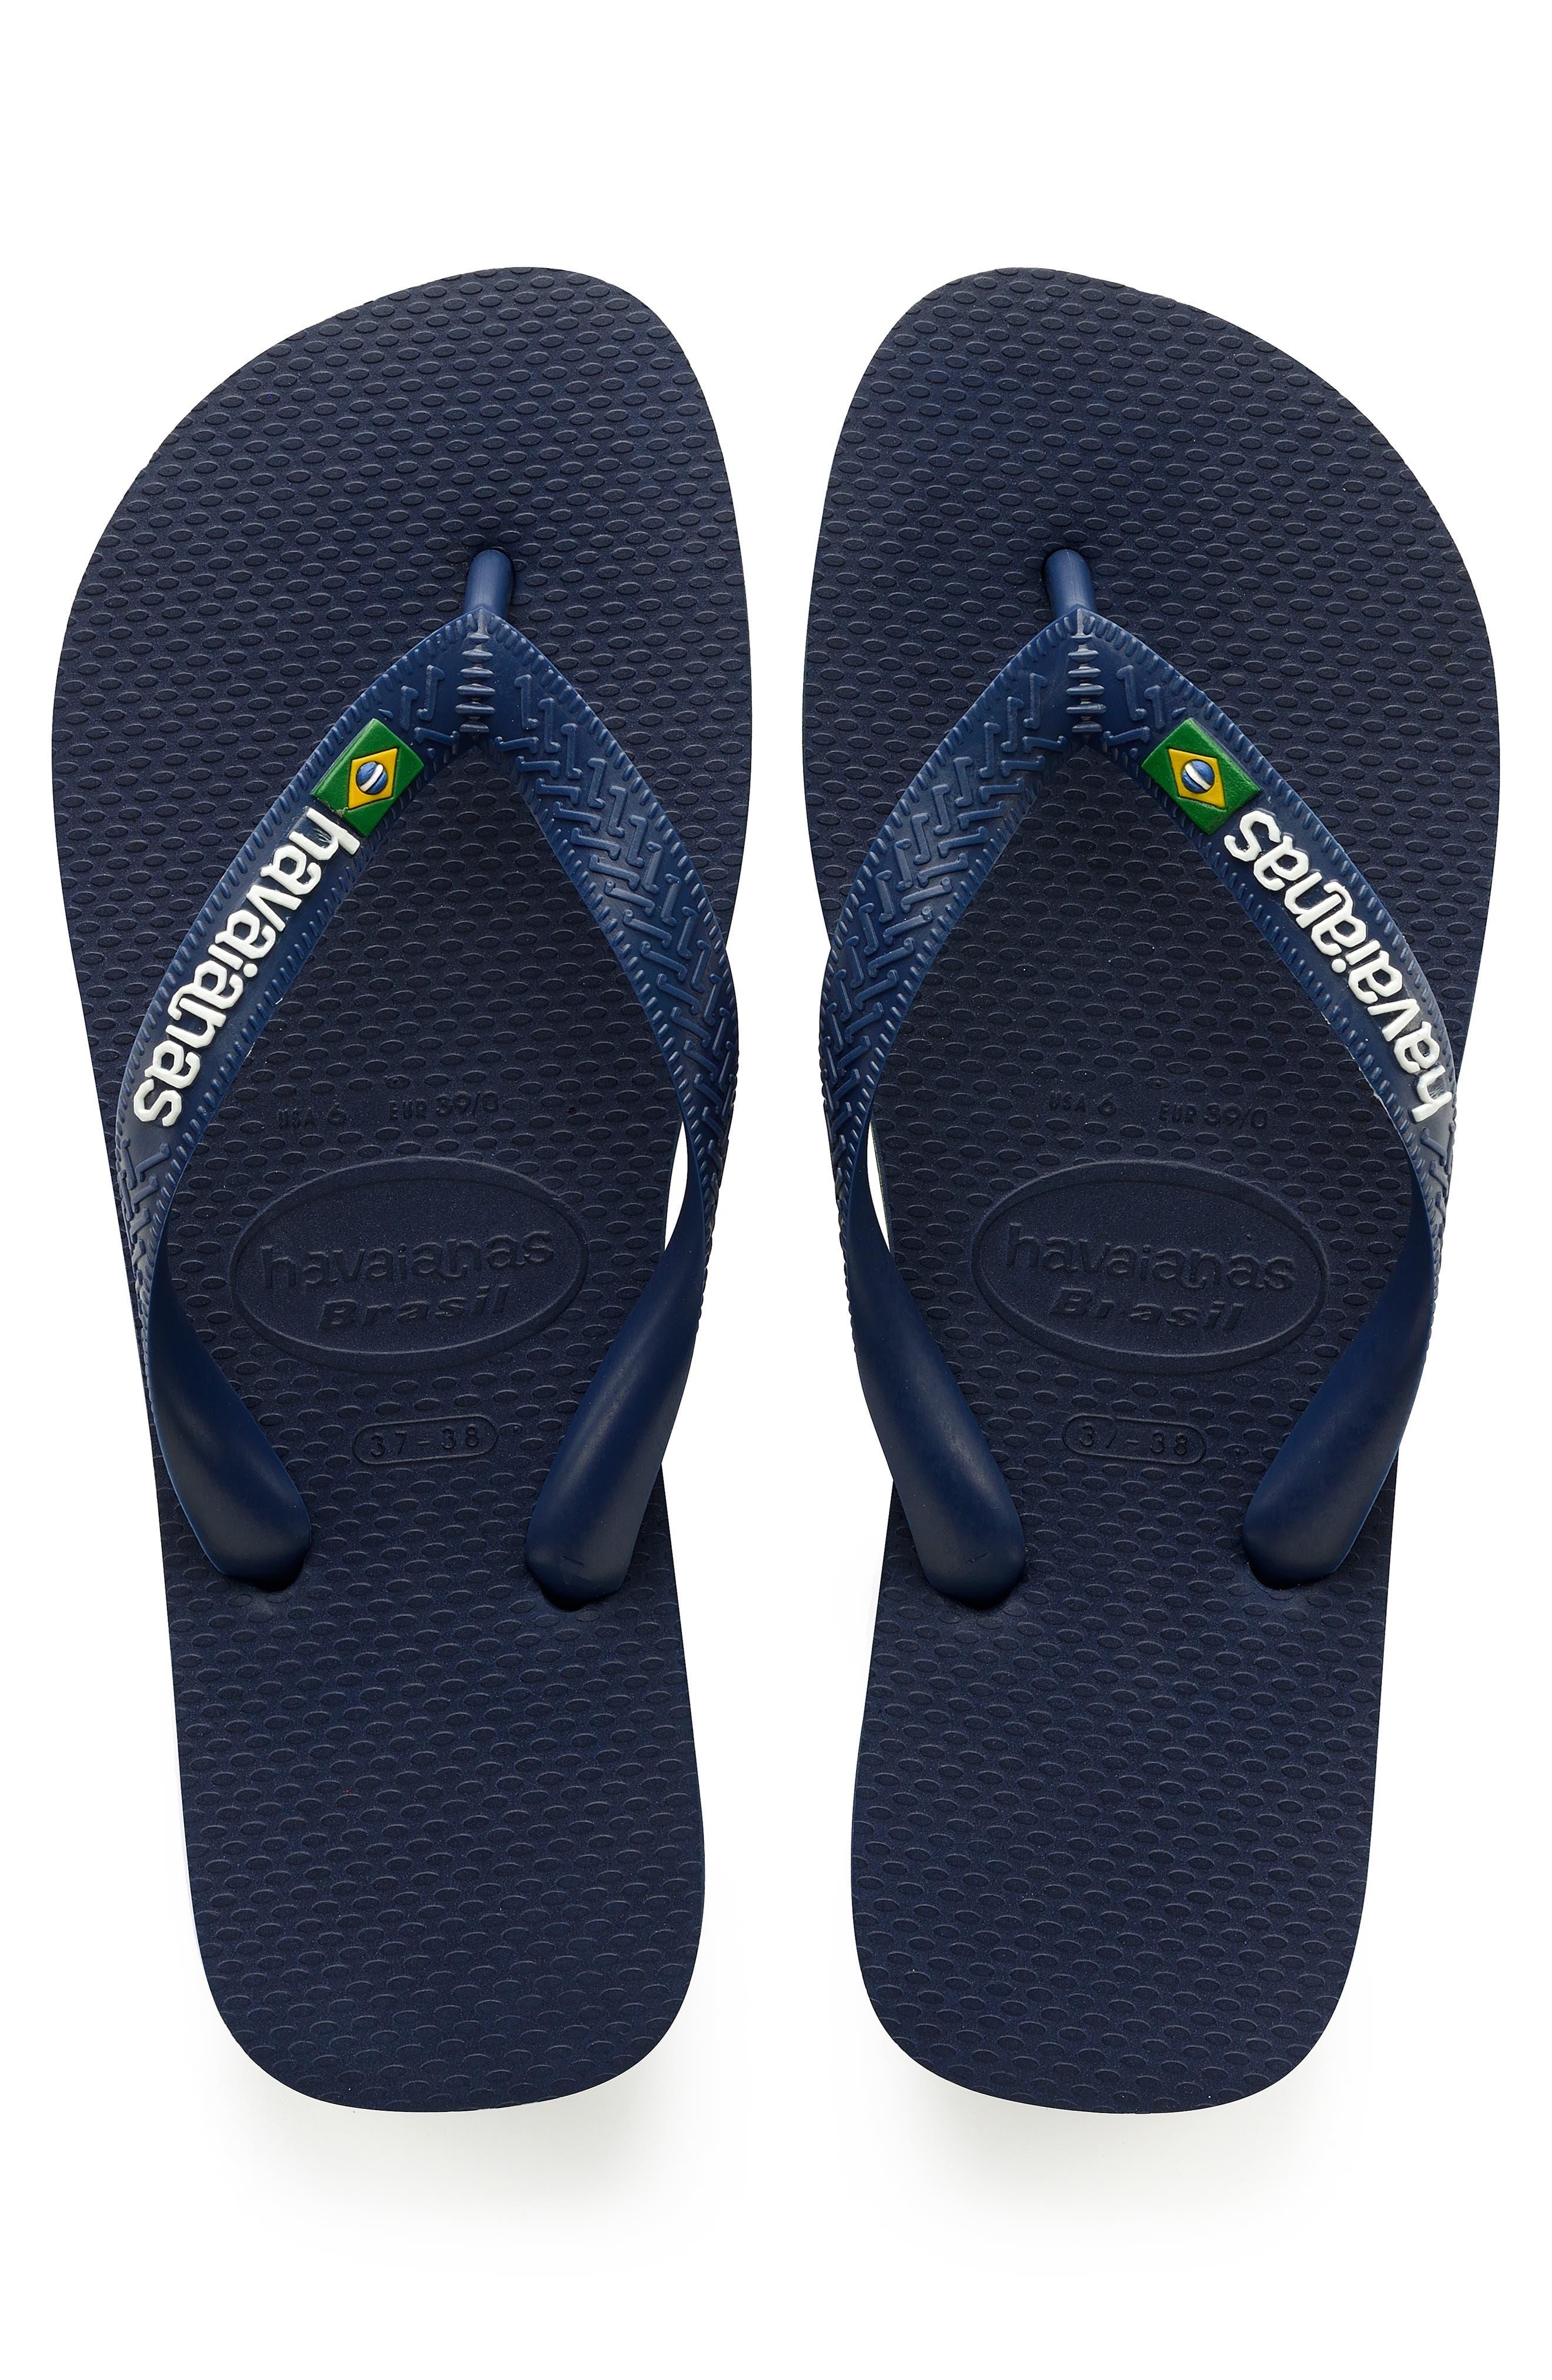 Brazil Flip Flop,                         Main,                         color, NAVY BLUE